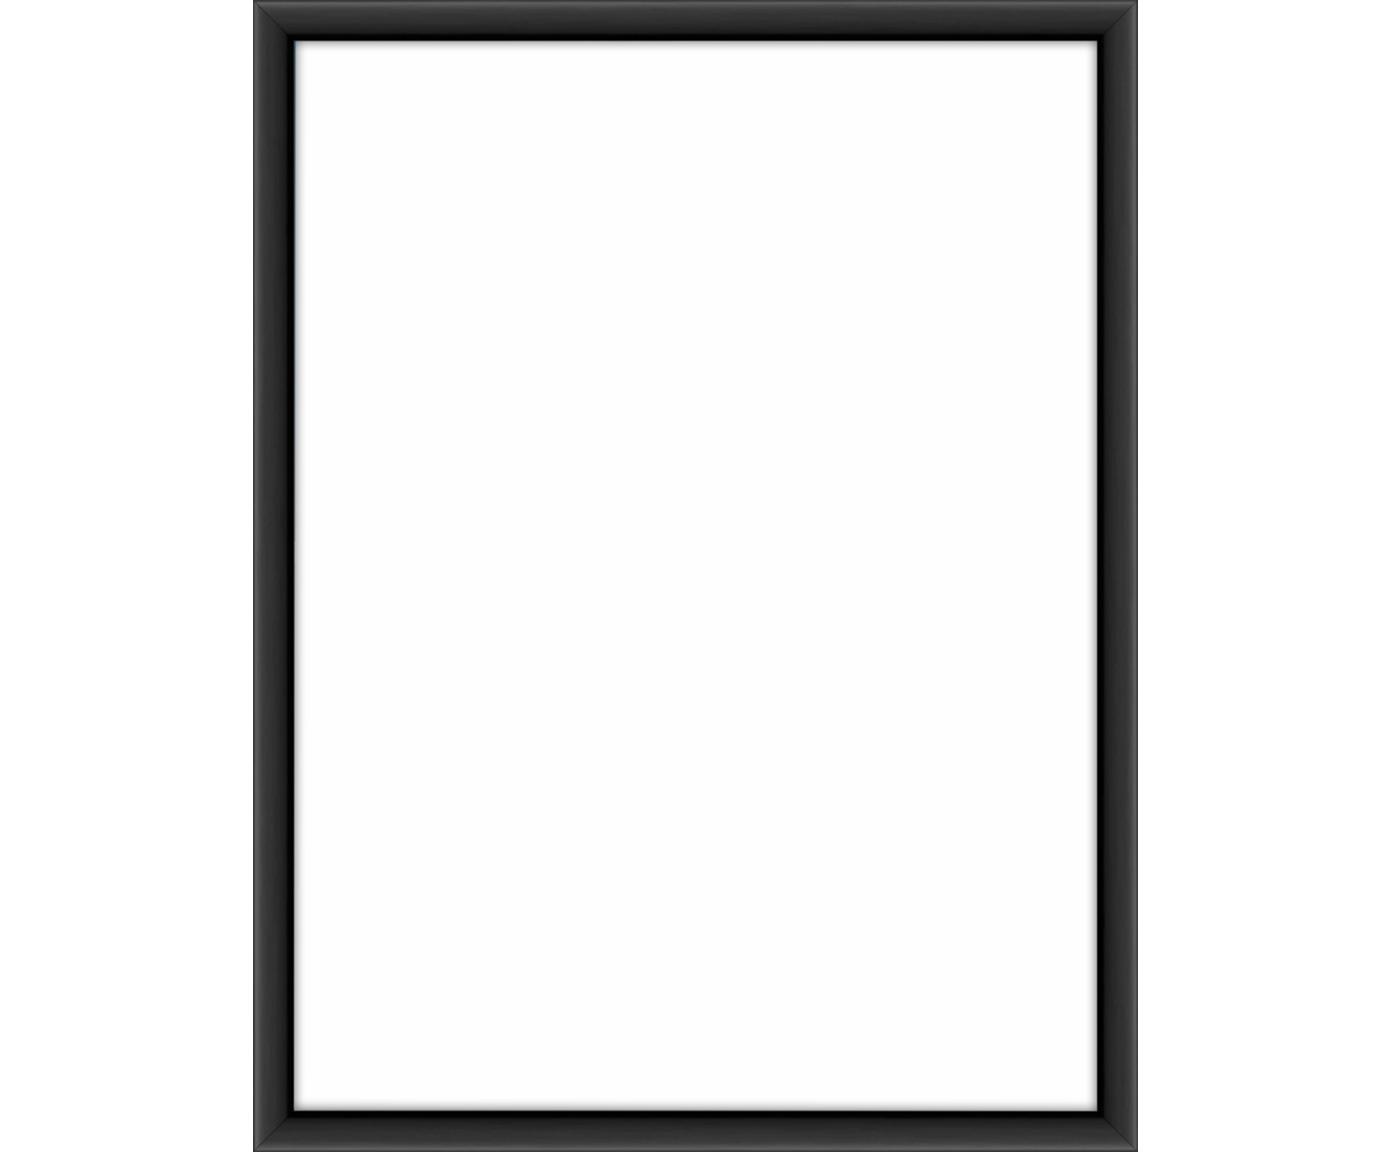 Marco Accent, Parte trasera: tablero de fibras de dens, Negro, 15 x 20 cm